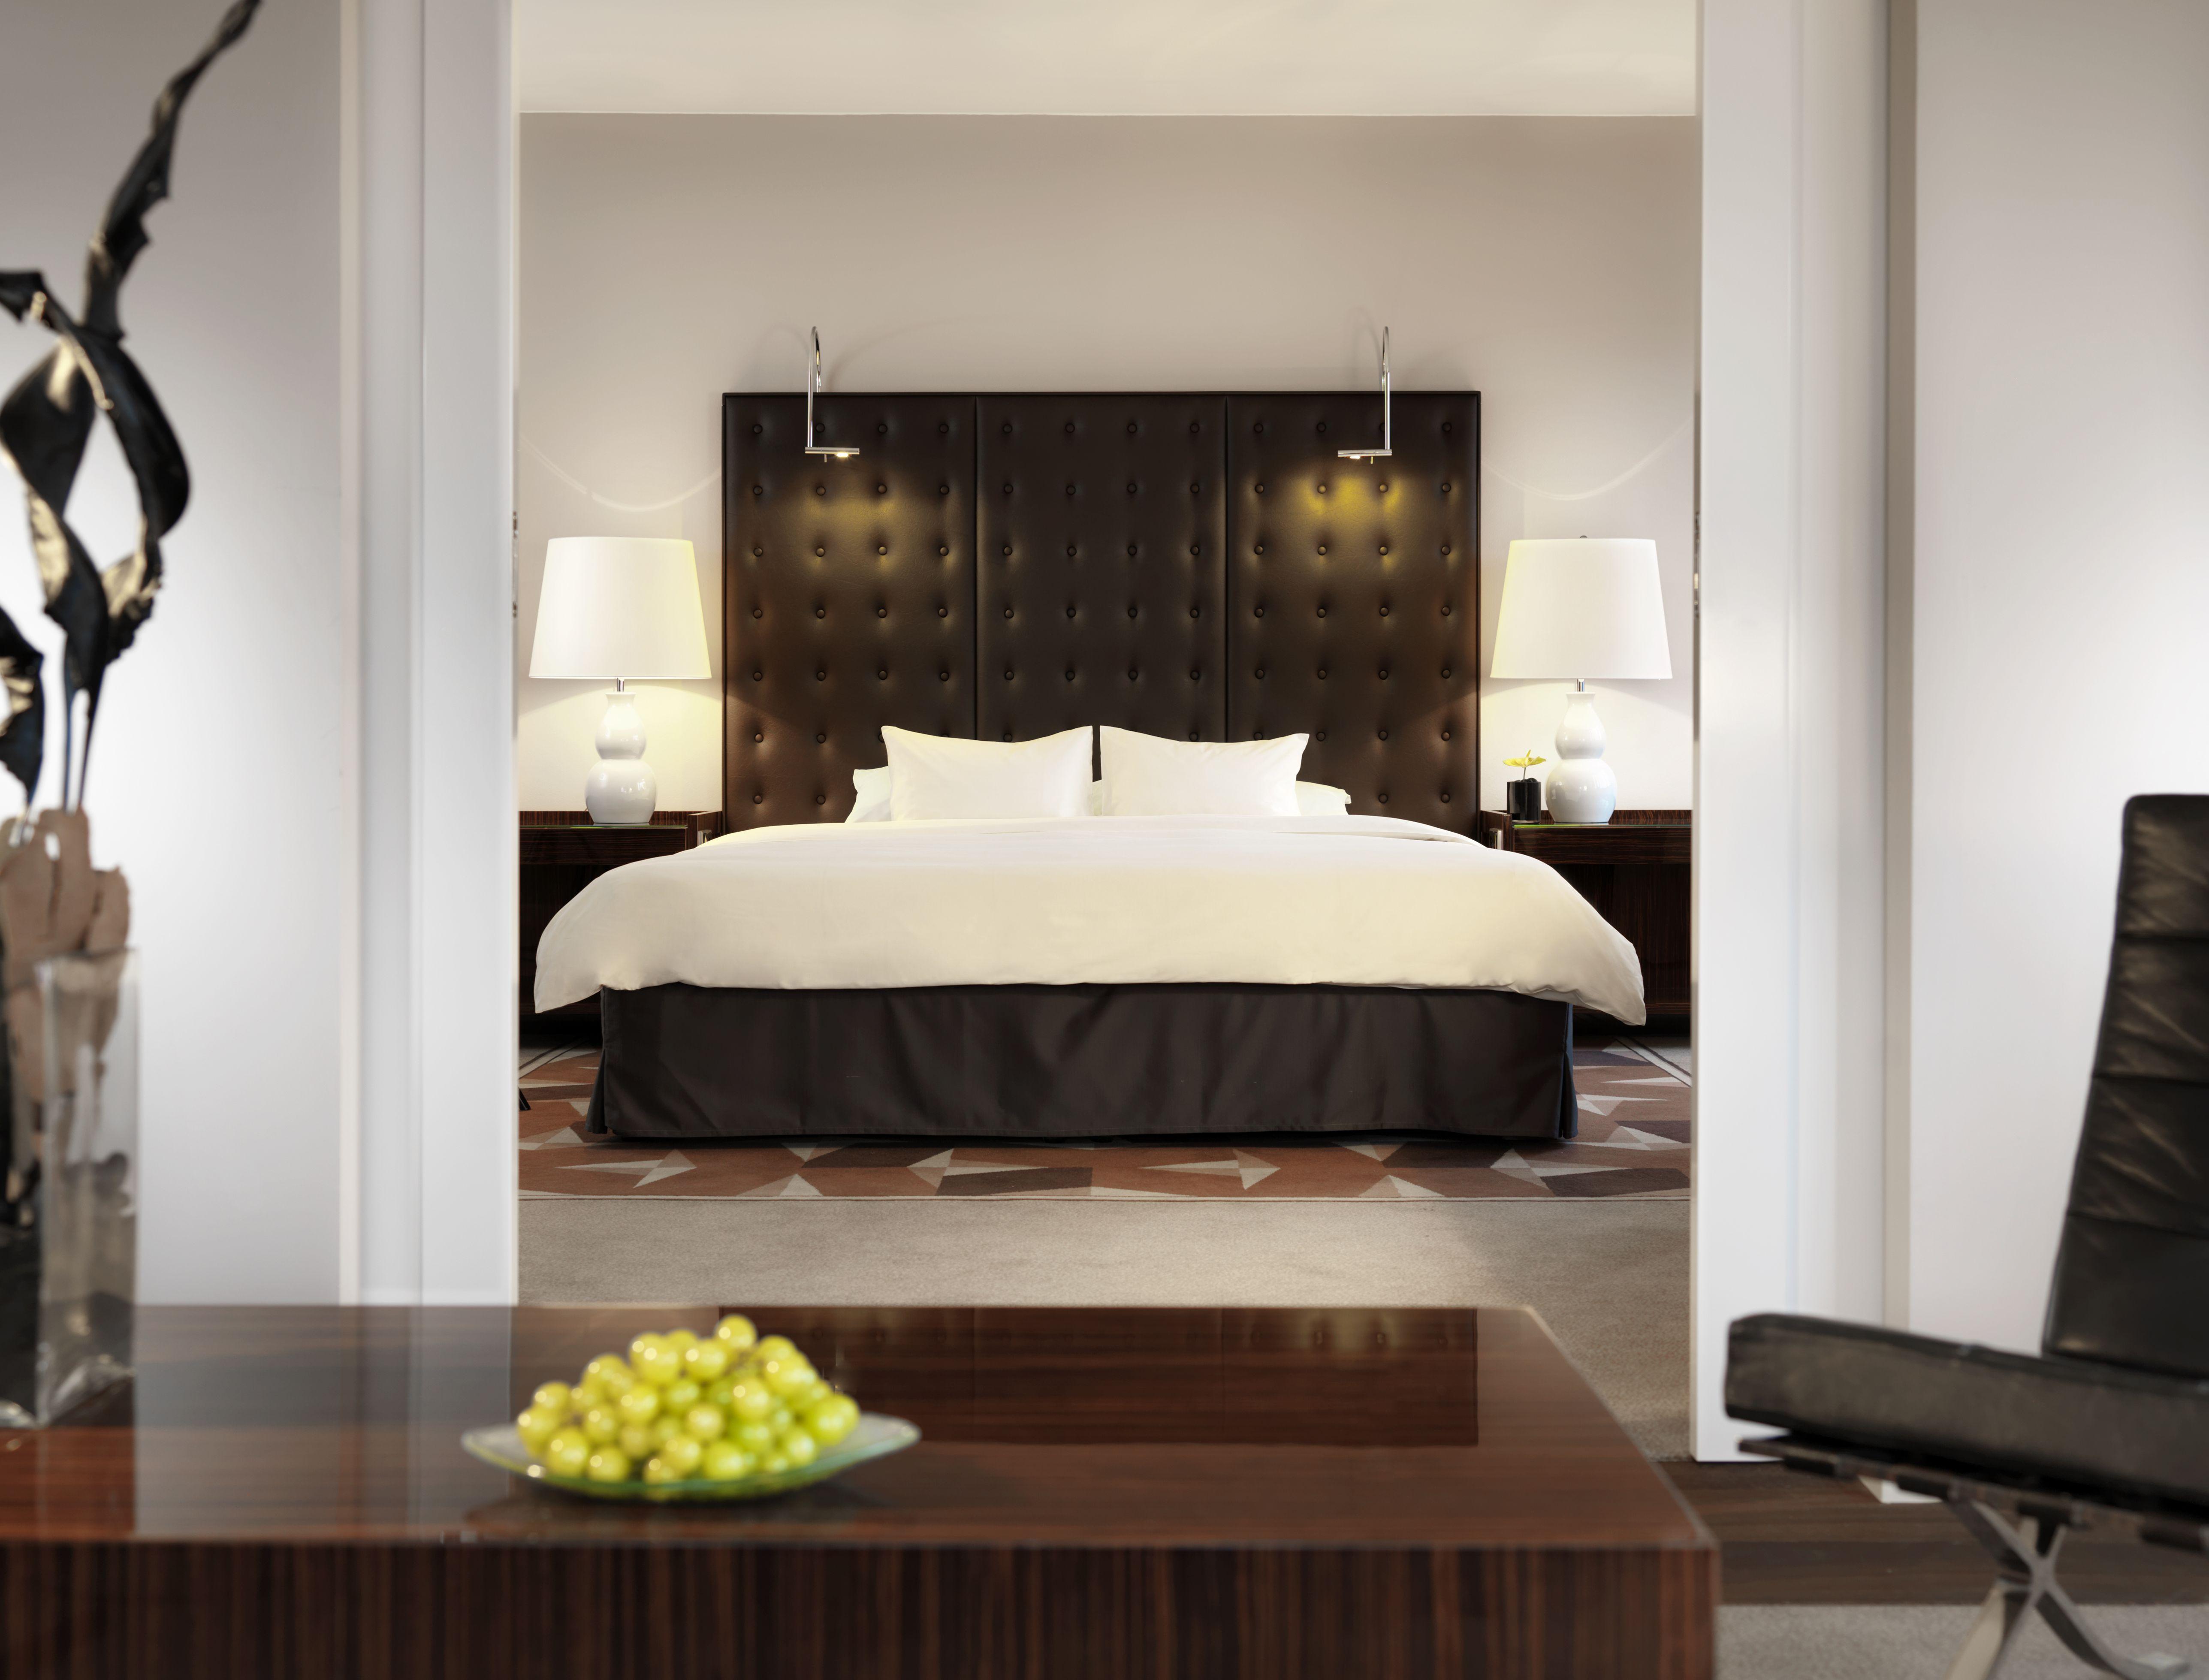 Luxuriös übernachten in Köln: Das Hotel HYATT REGENCY ...